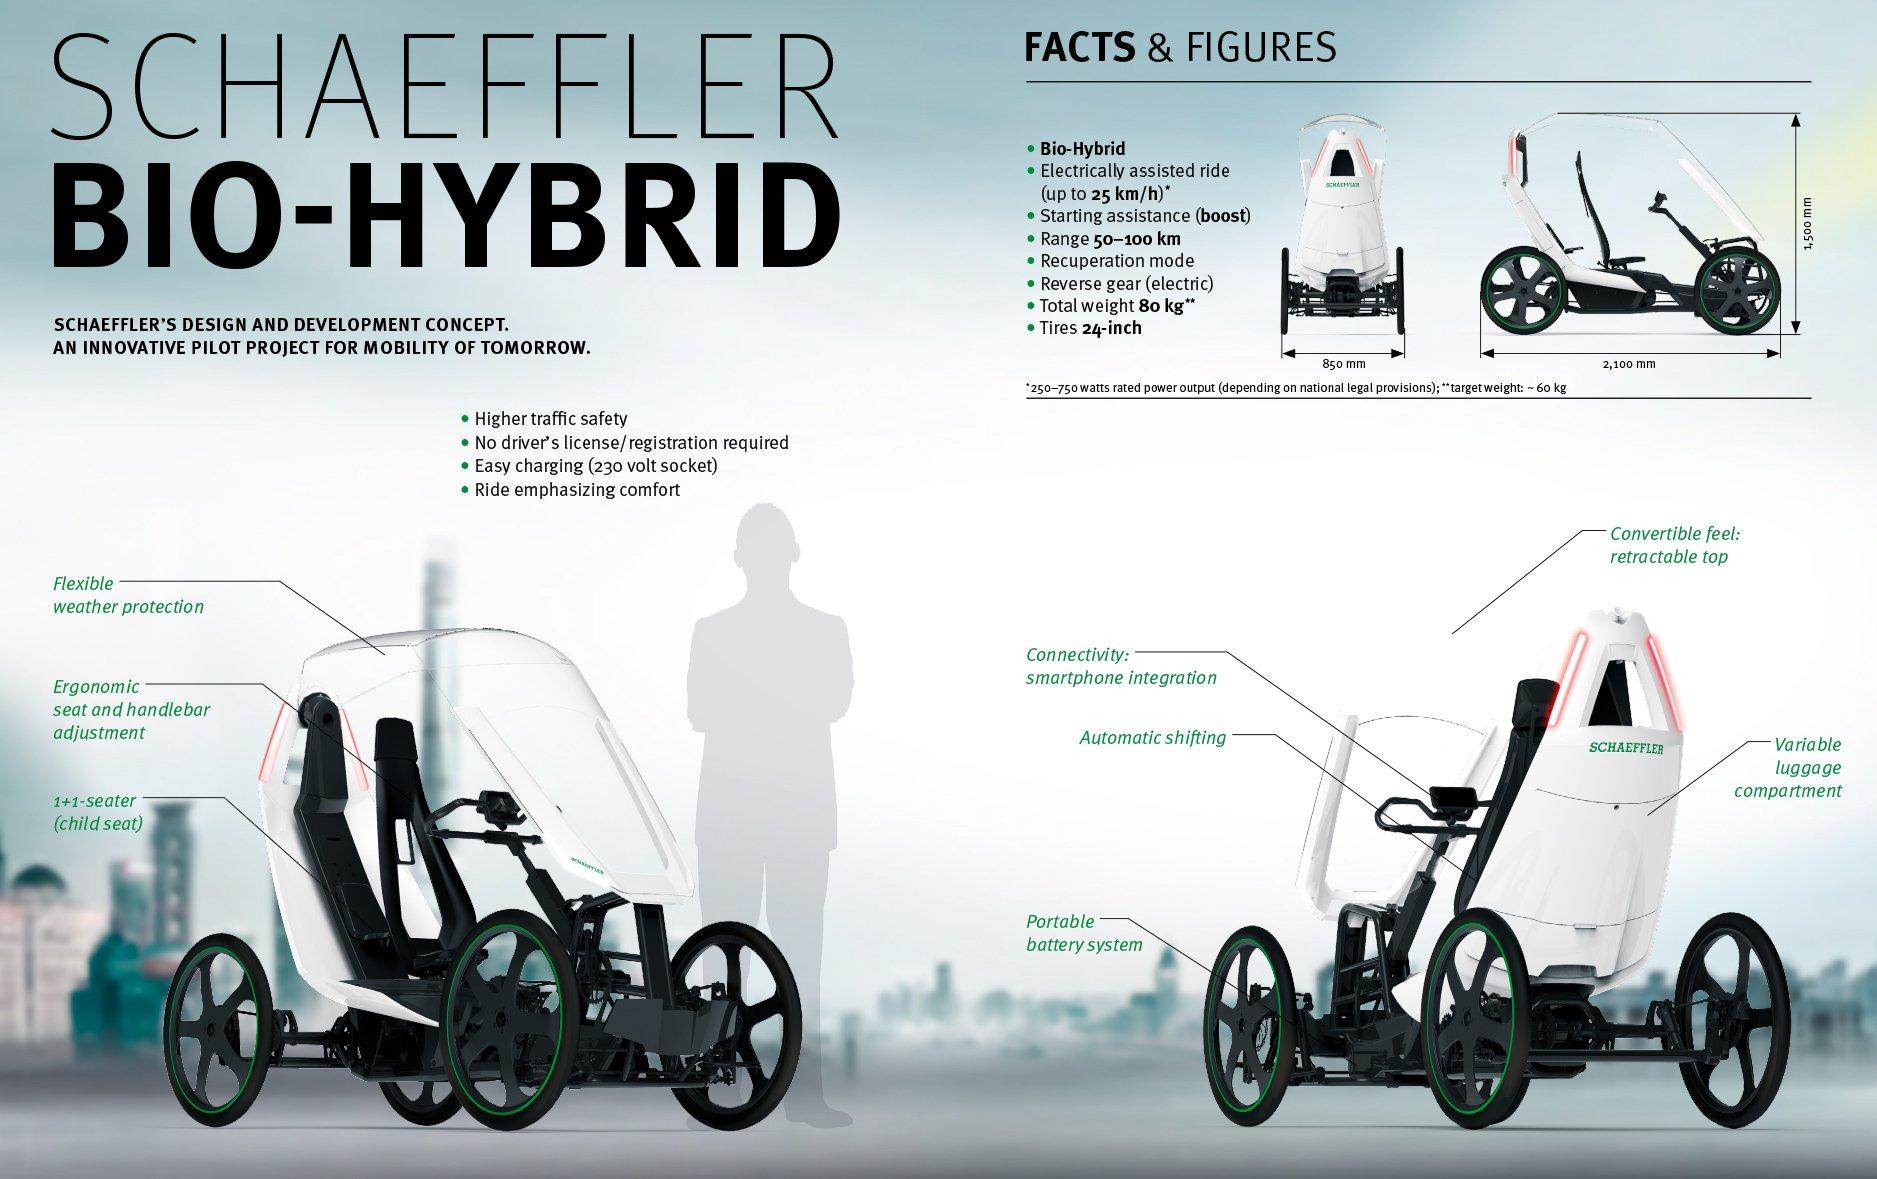 Schaeffler Group On Twitter Quot Schaeffler S Biohybrid Got